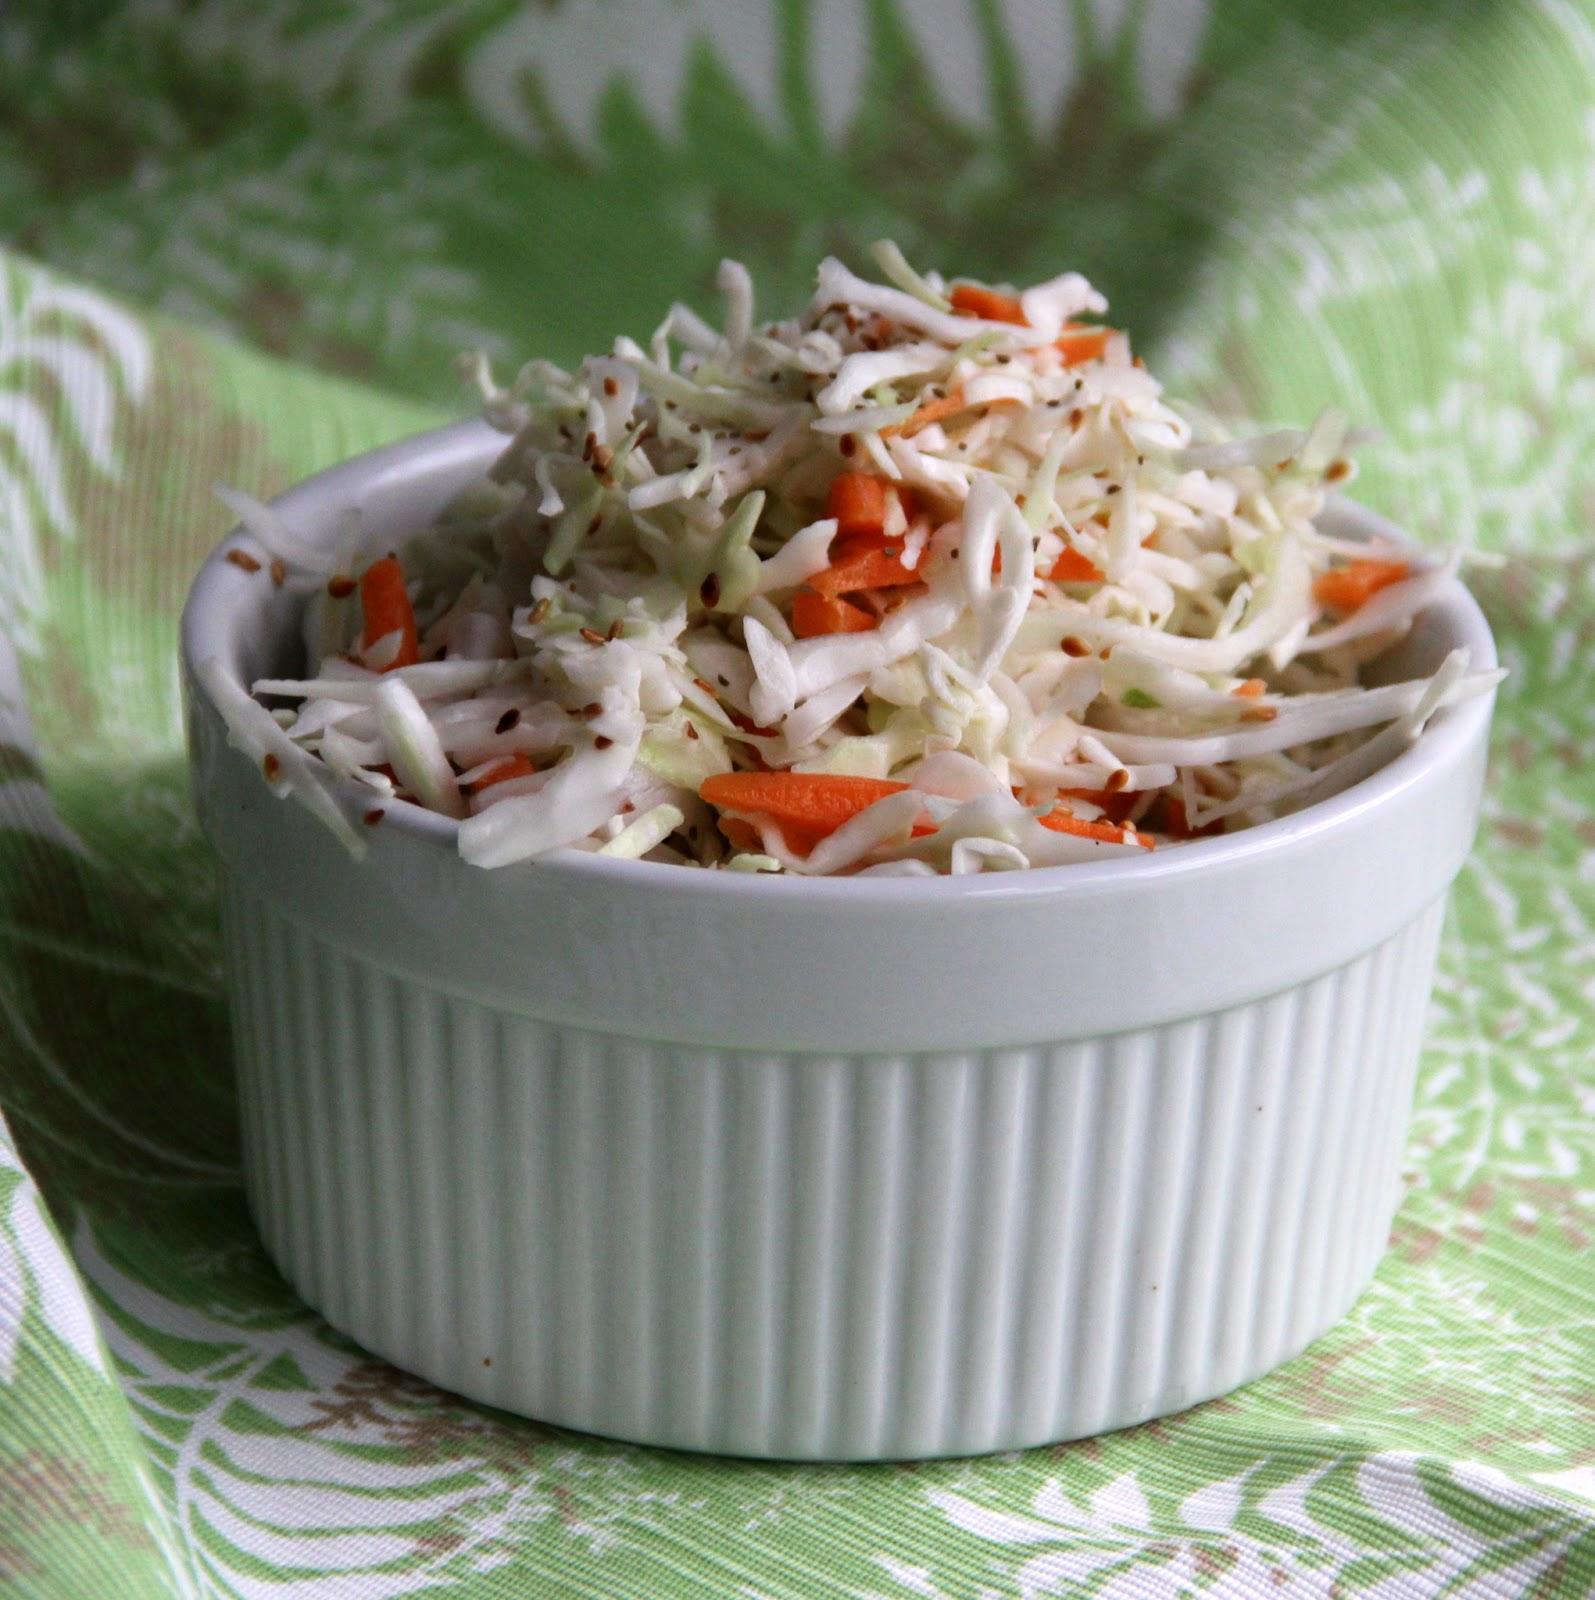 Lick coleslaw recipe phrase... super